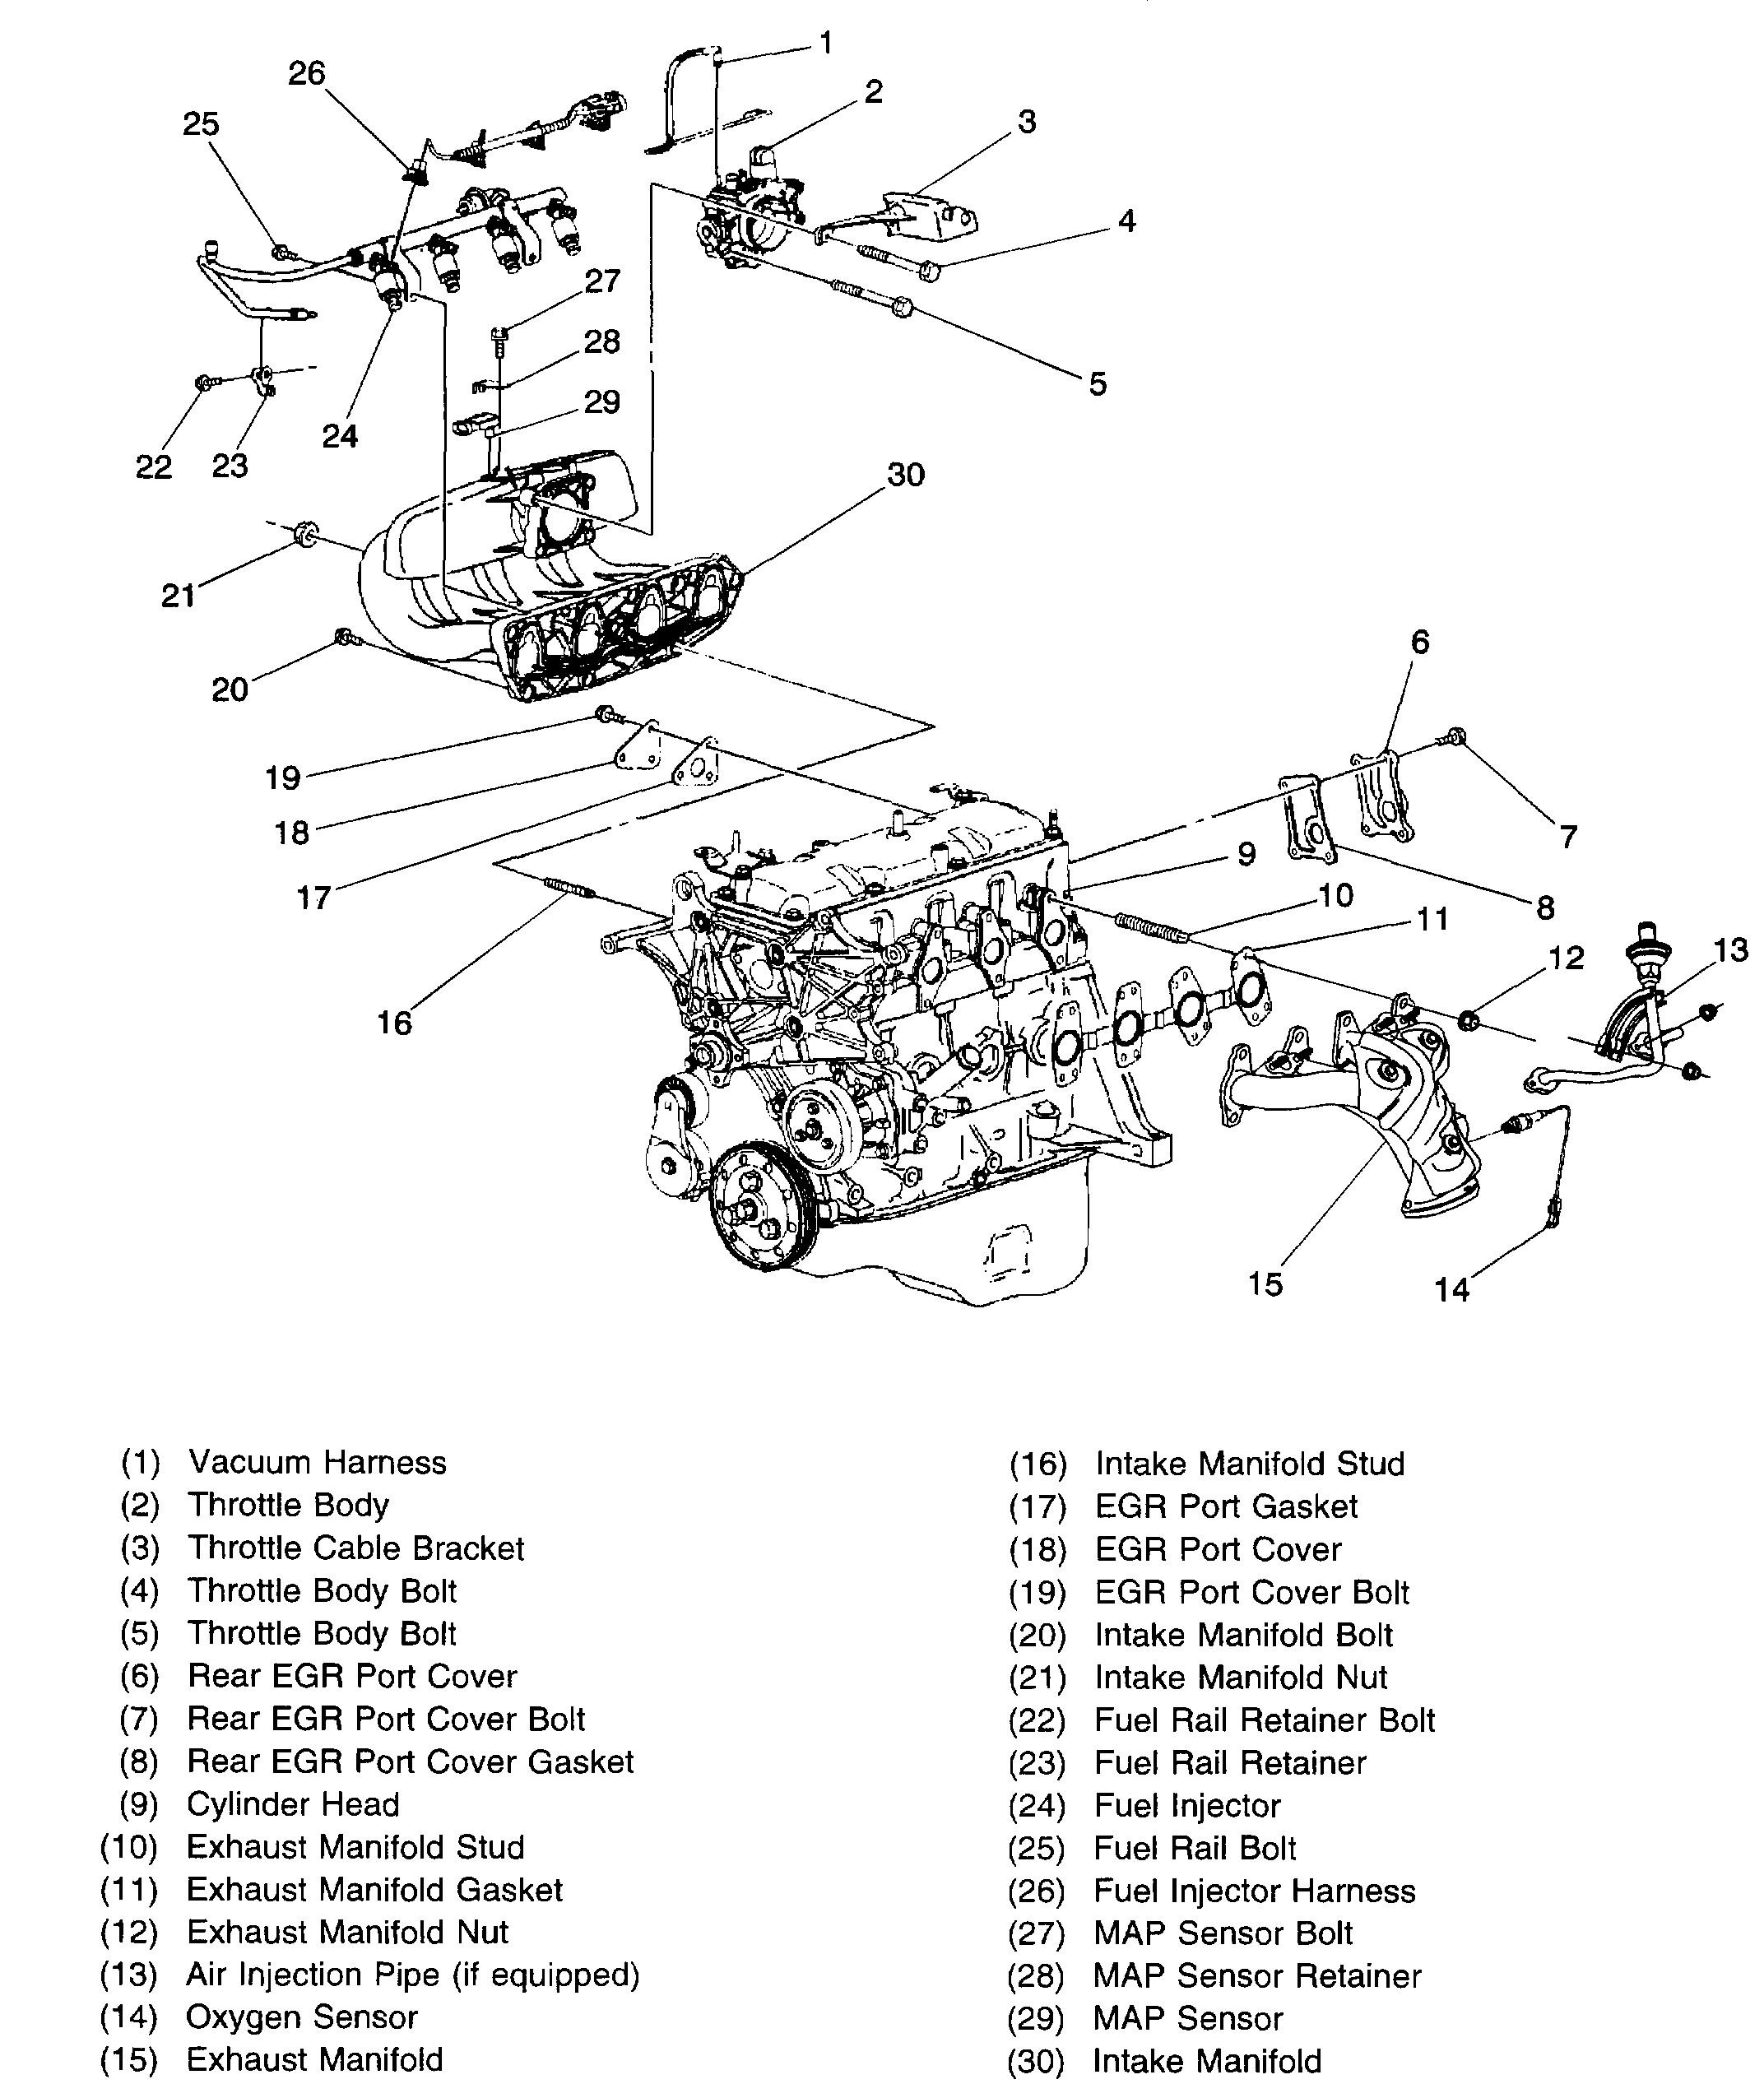 Ecotec 2.2 Engine Oil Circulation System Diagram Diagram] 2 2 Liter Chevrolet Engine Diagram Full Version Hd Of Ecotec 2.2 Engine Oil Circulation System Diagram